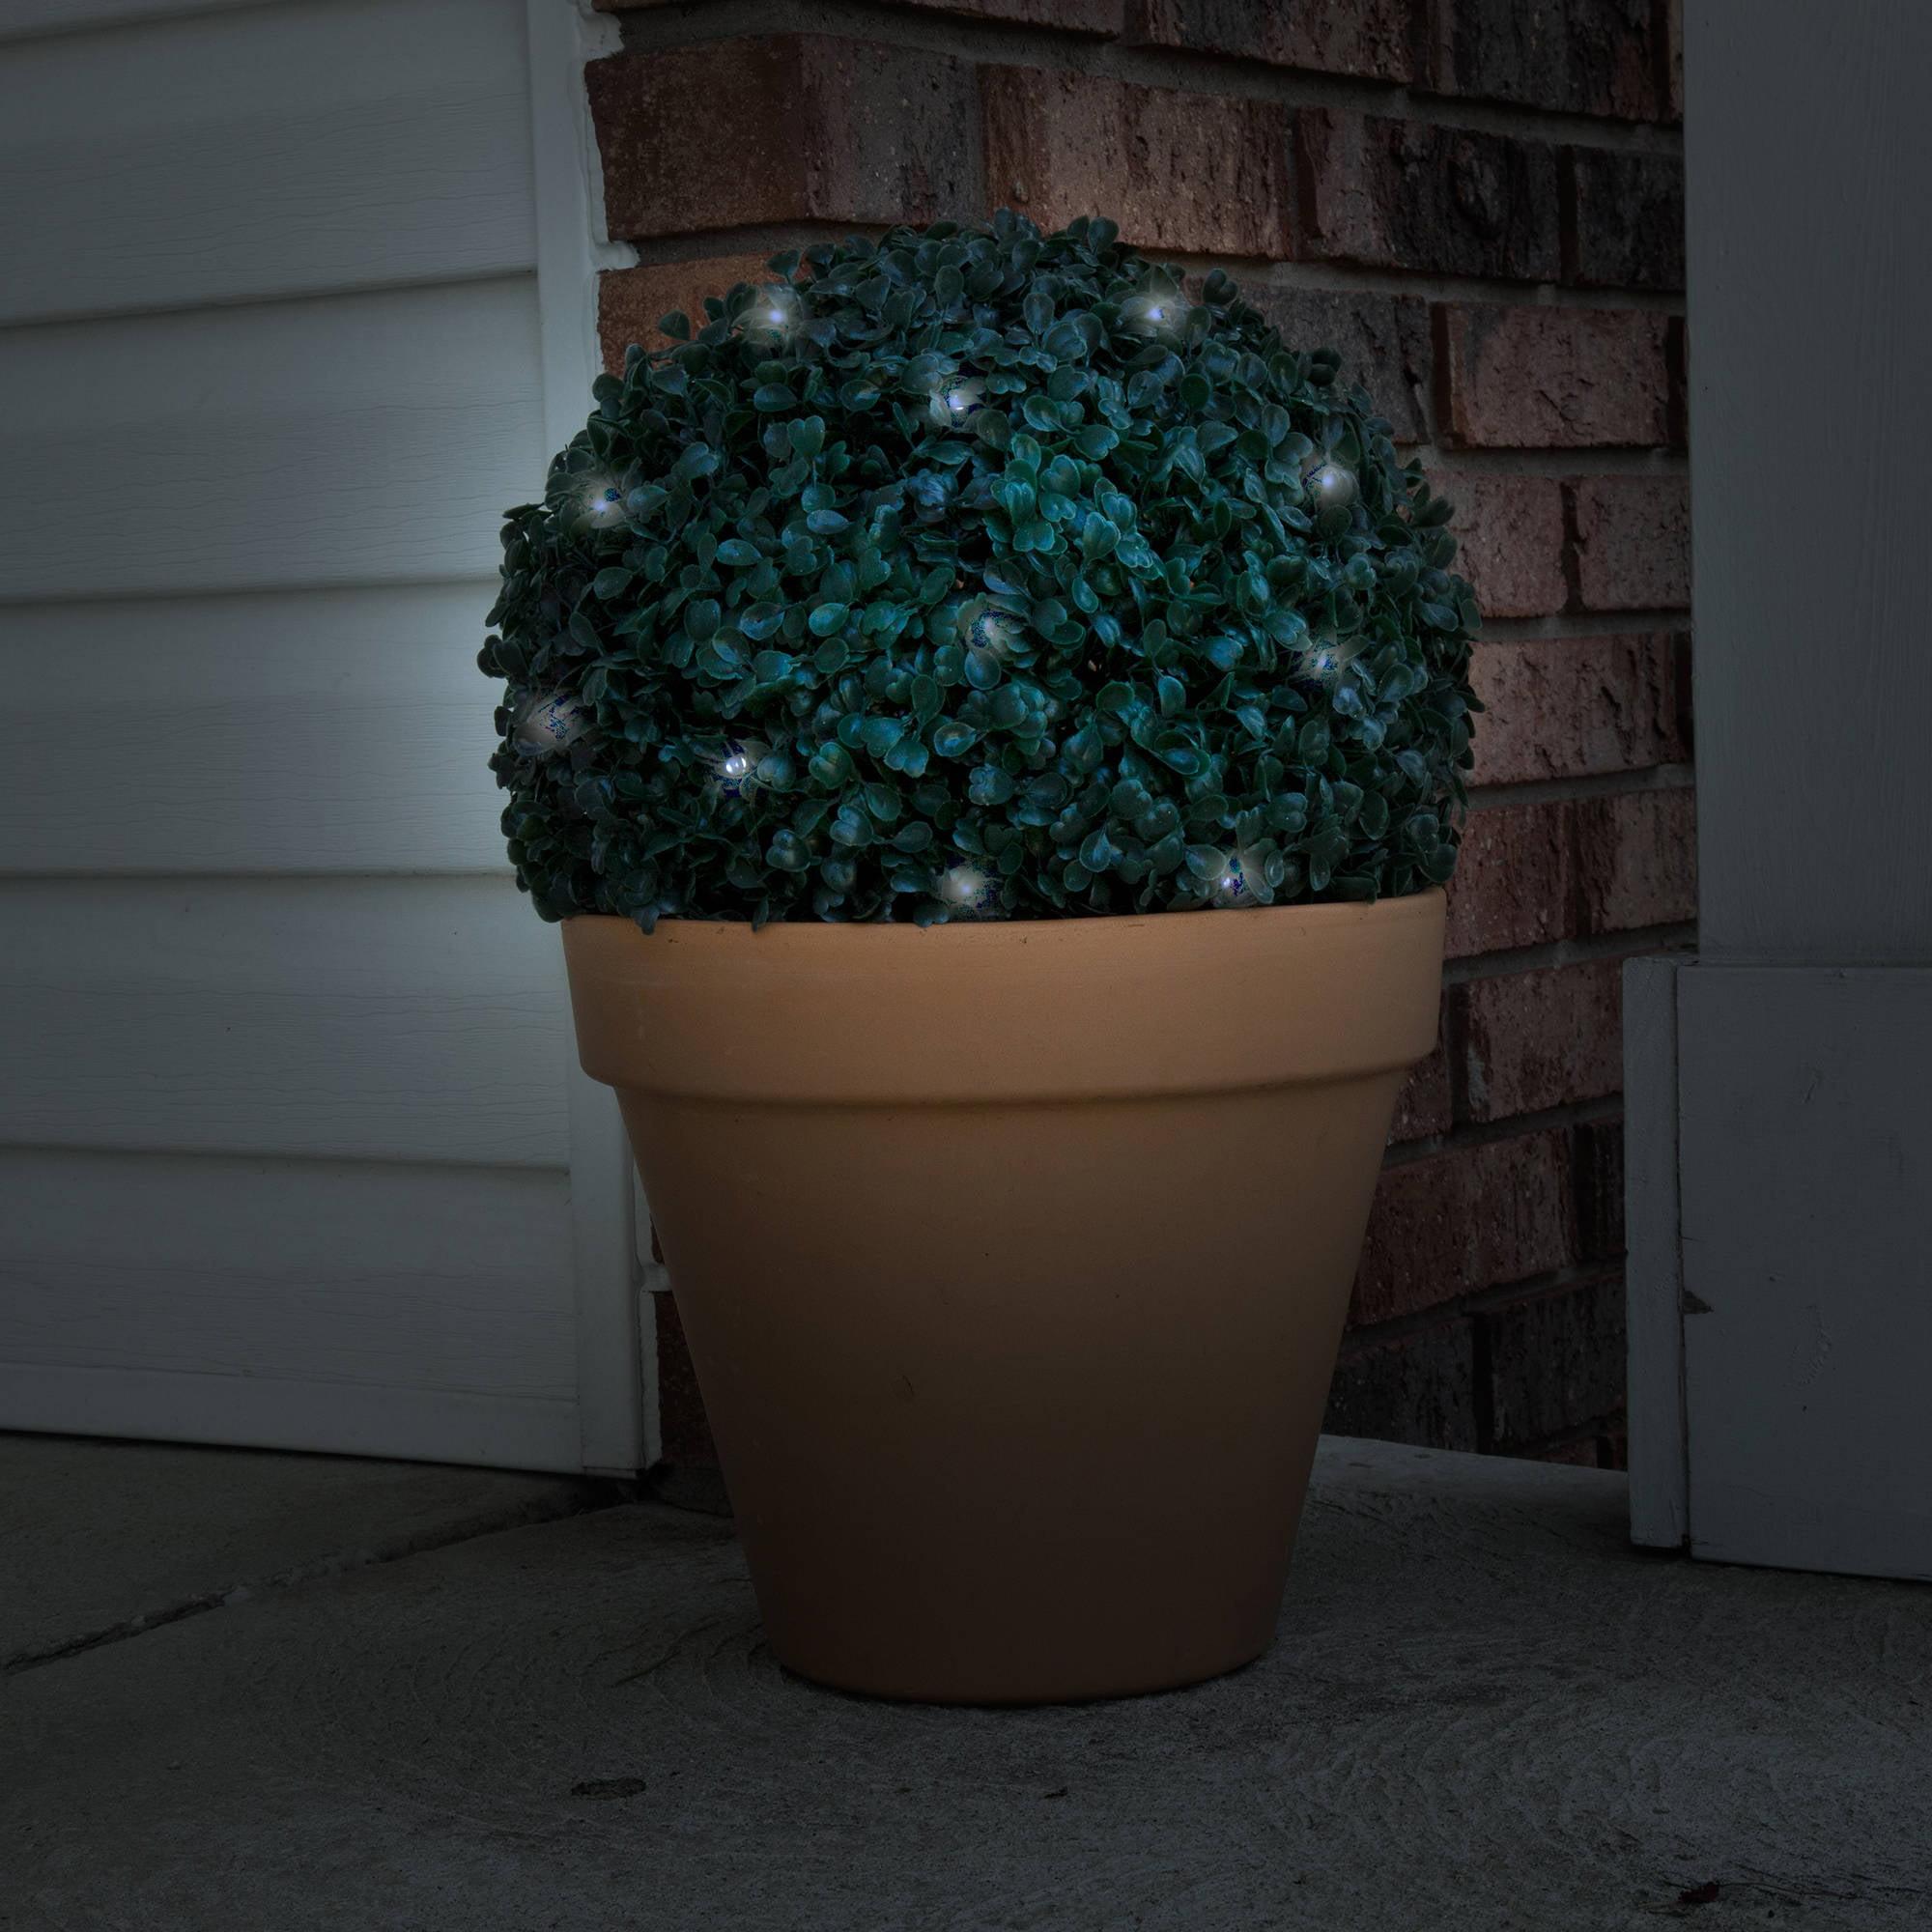 Pure Garden Topiary Solar Light Ball, 20 White LED Lights by Trademark Global LLC